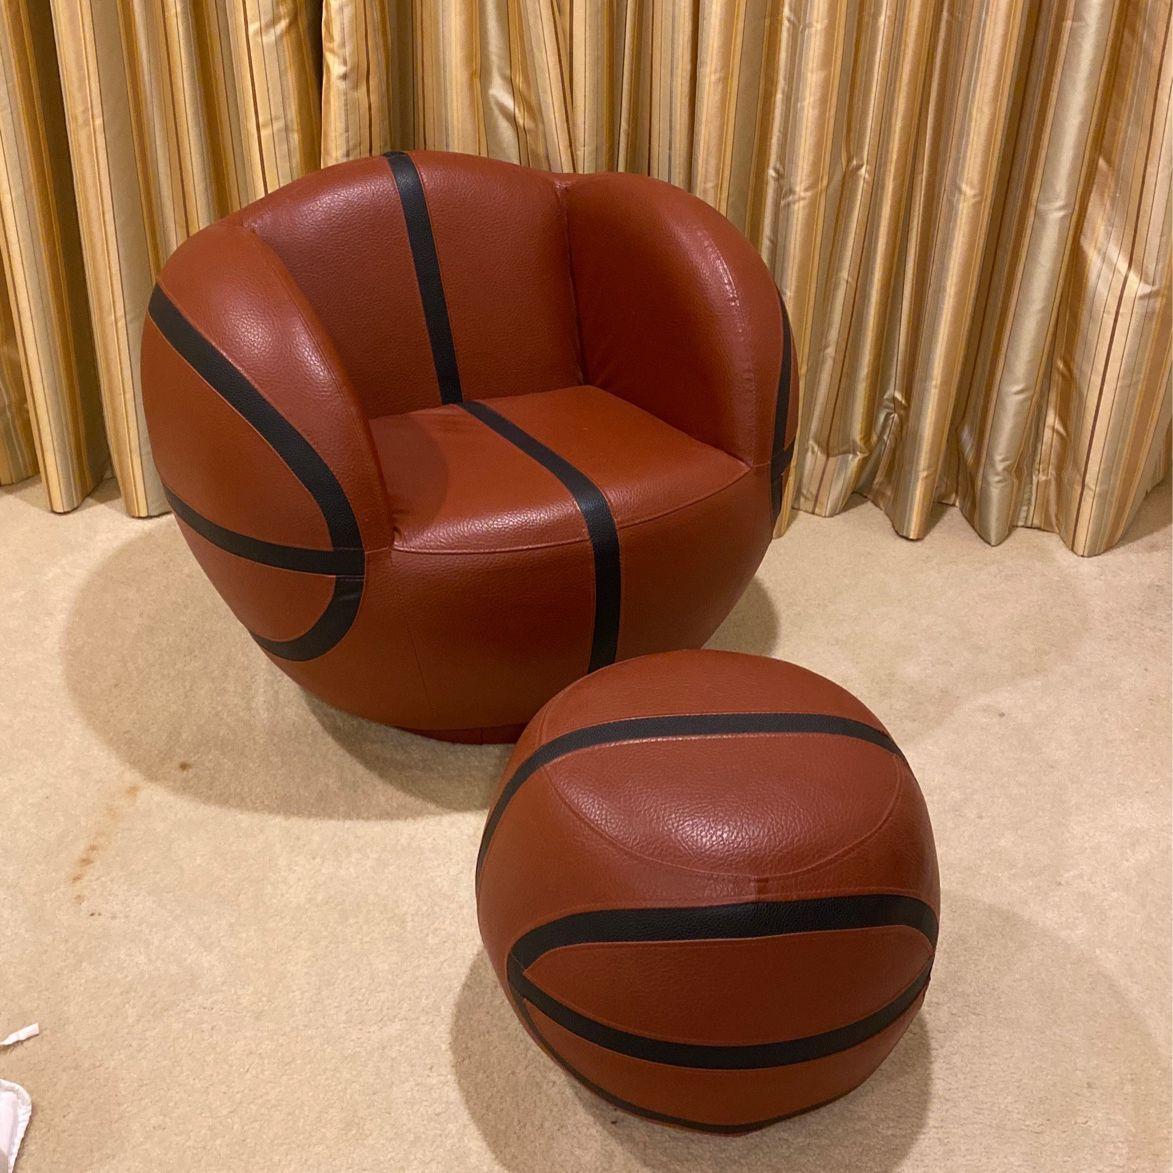 All Star 2-Piece Chair & Ottoman